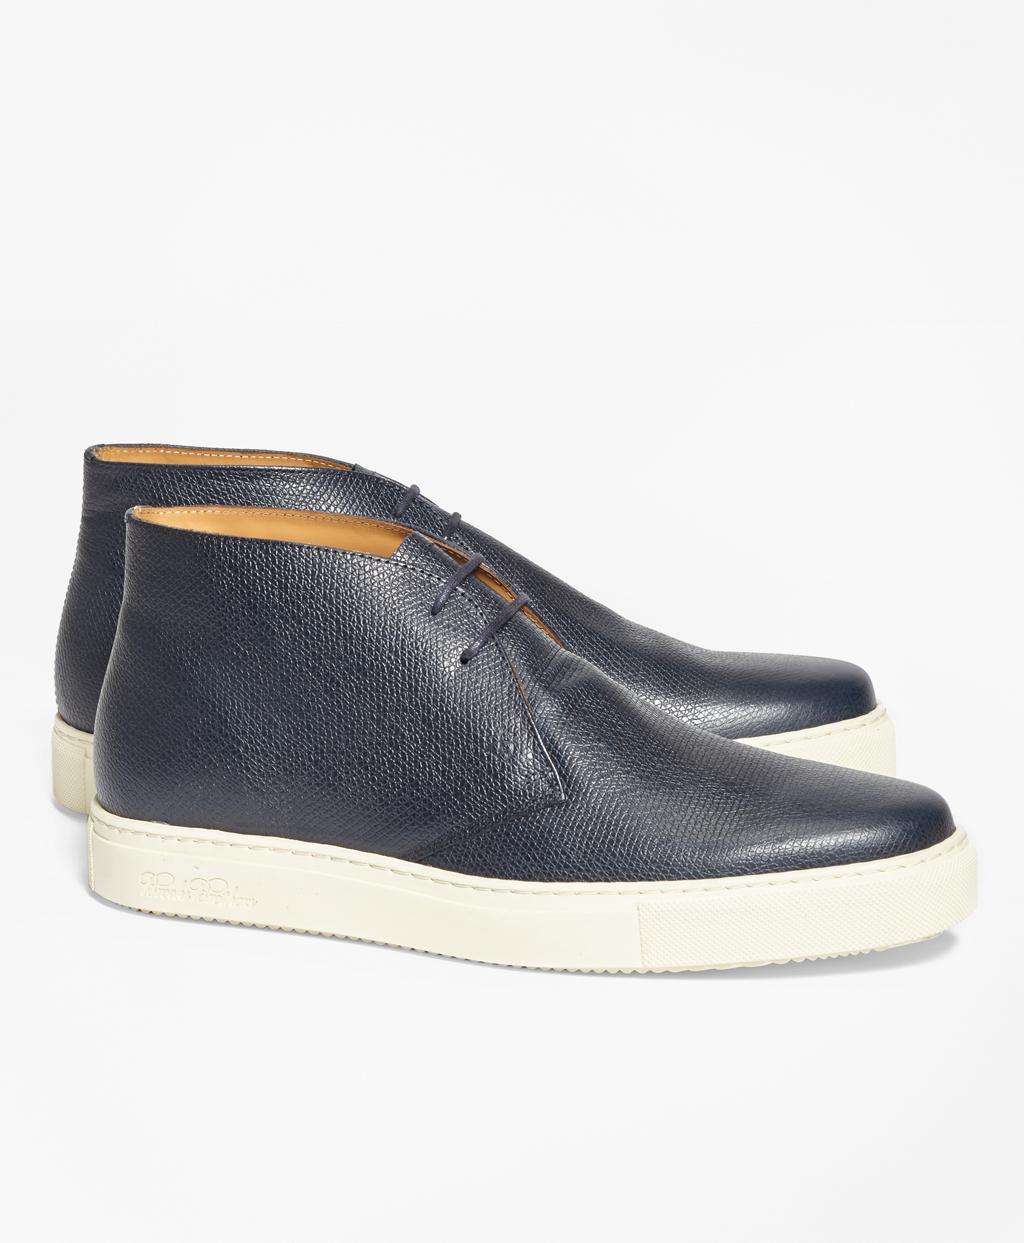 f566d143954 Lyst - Brooks Brothers 1818 Footwear Textured Leather Chukka ...